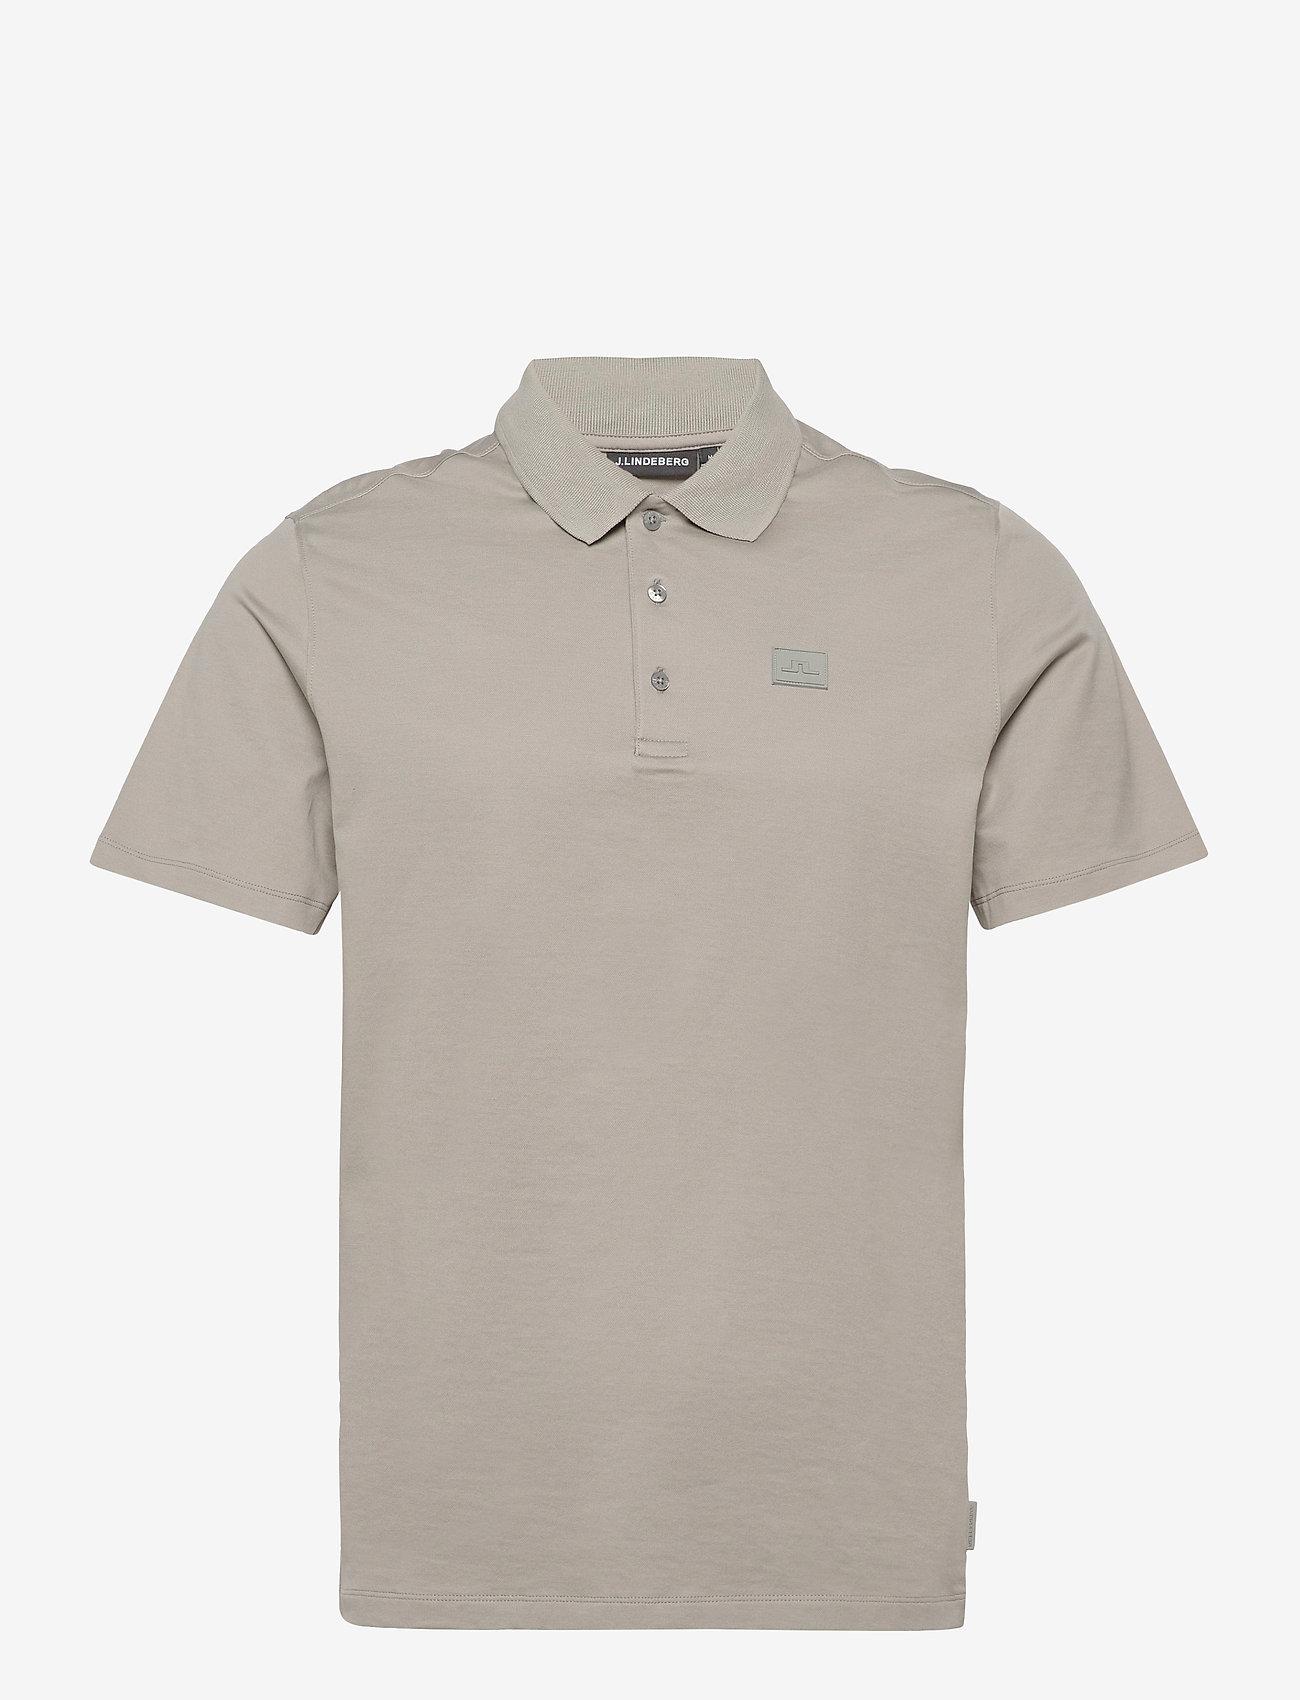 J. Lindeberg - Miles Jersey Polo Shirt - kurzärmelig - mid grey - 1